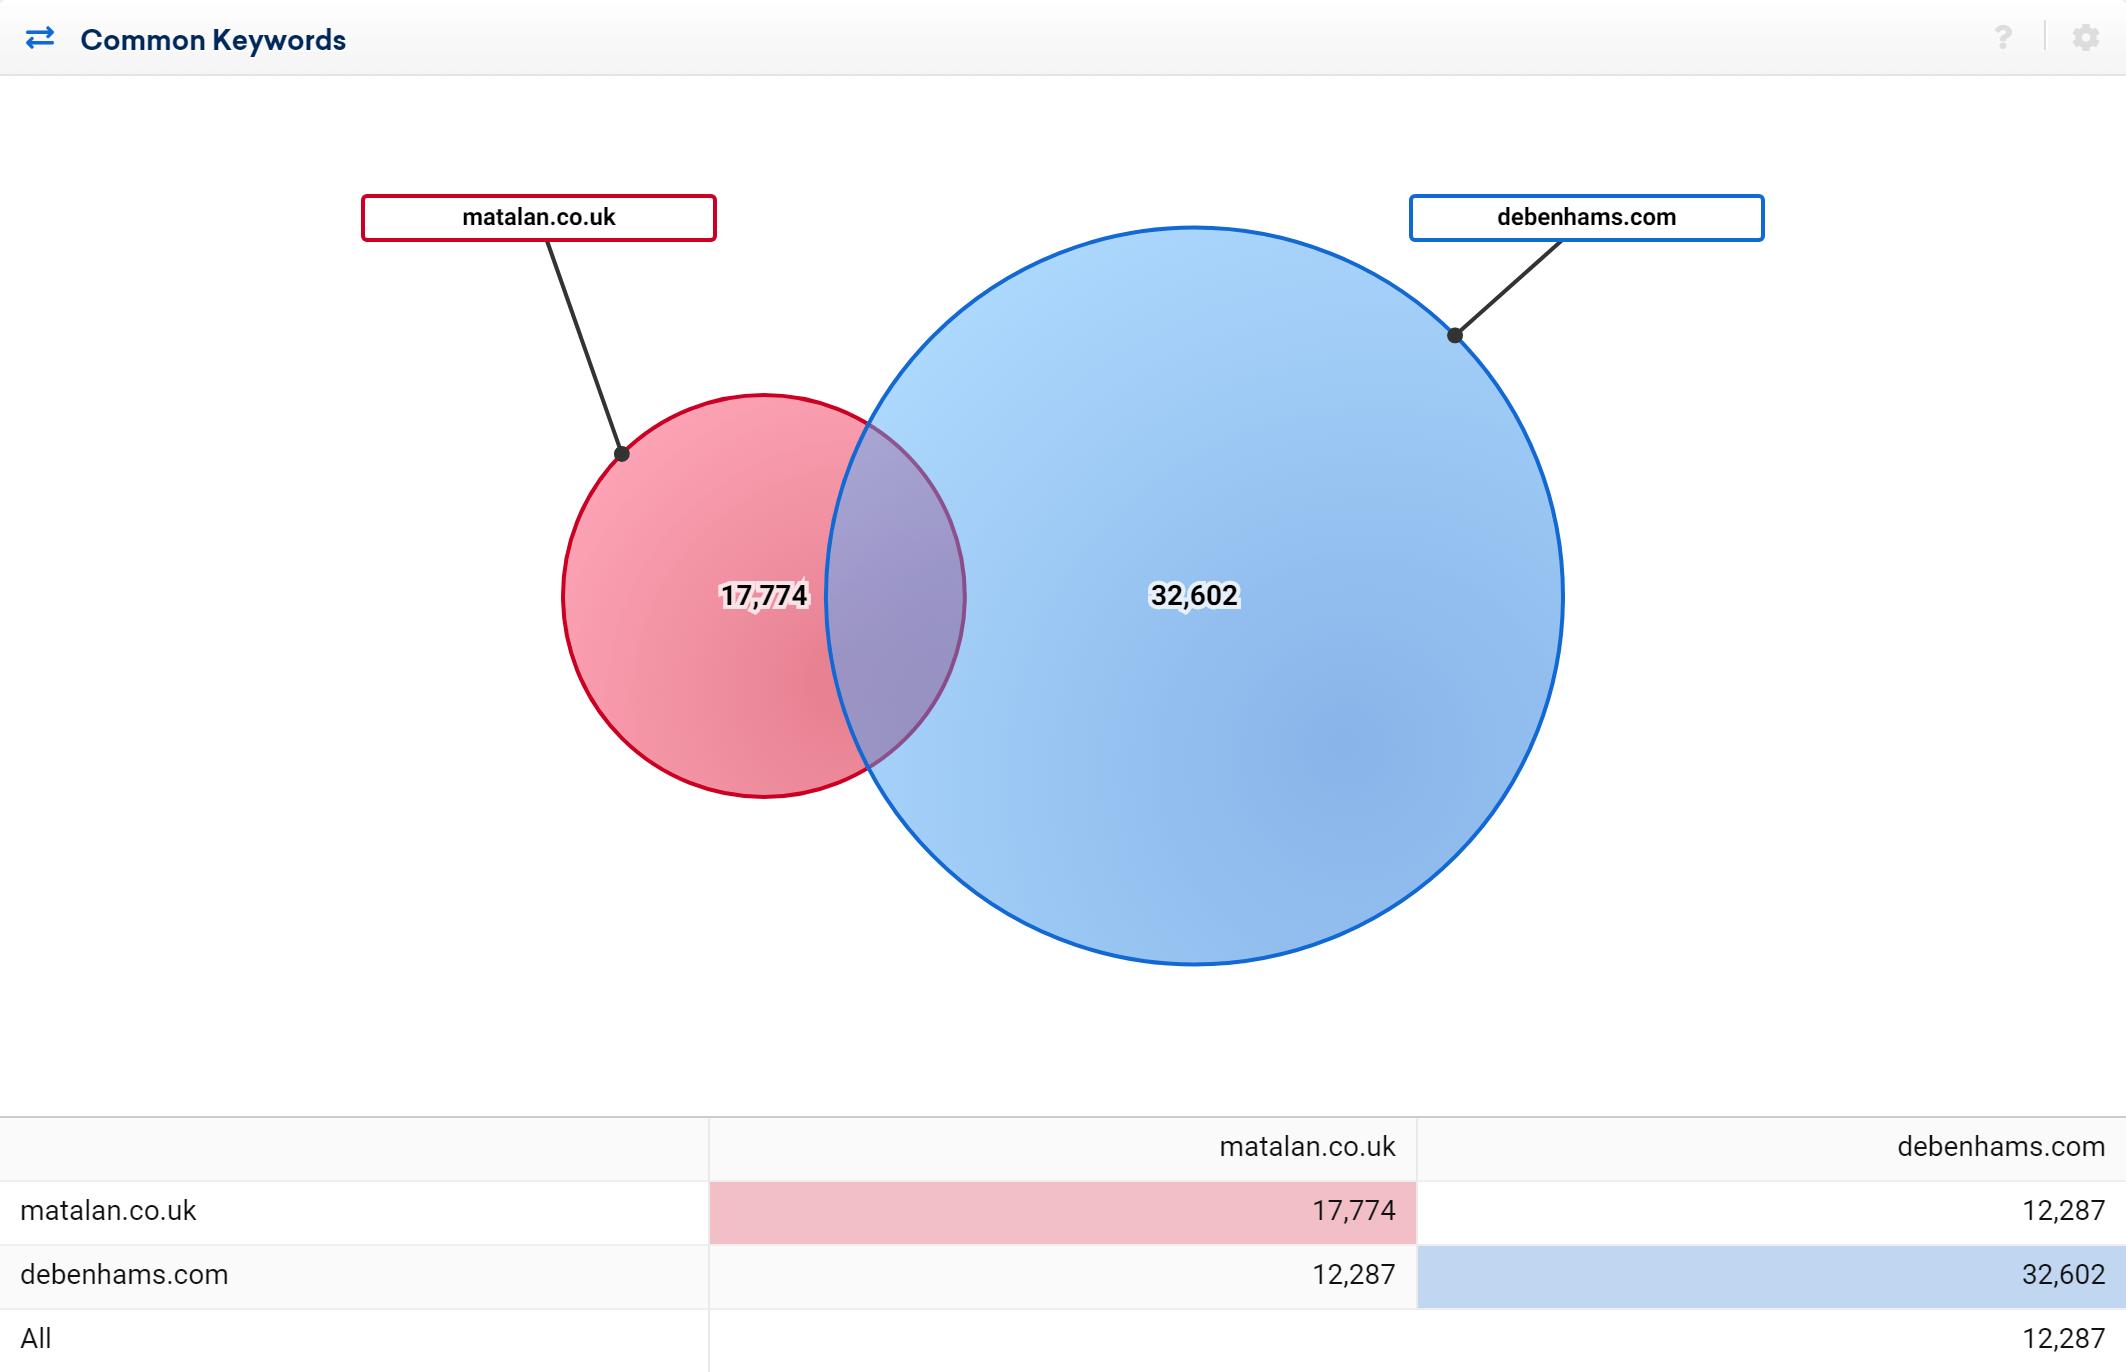 Comparison between matalan.co.uk and debenhams.com in 2019